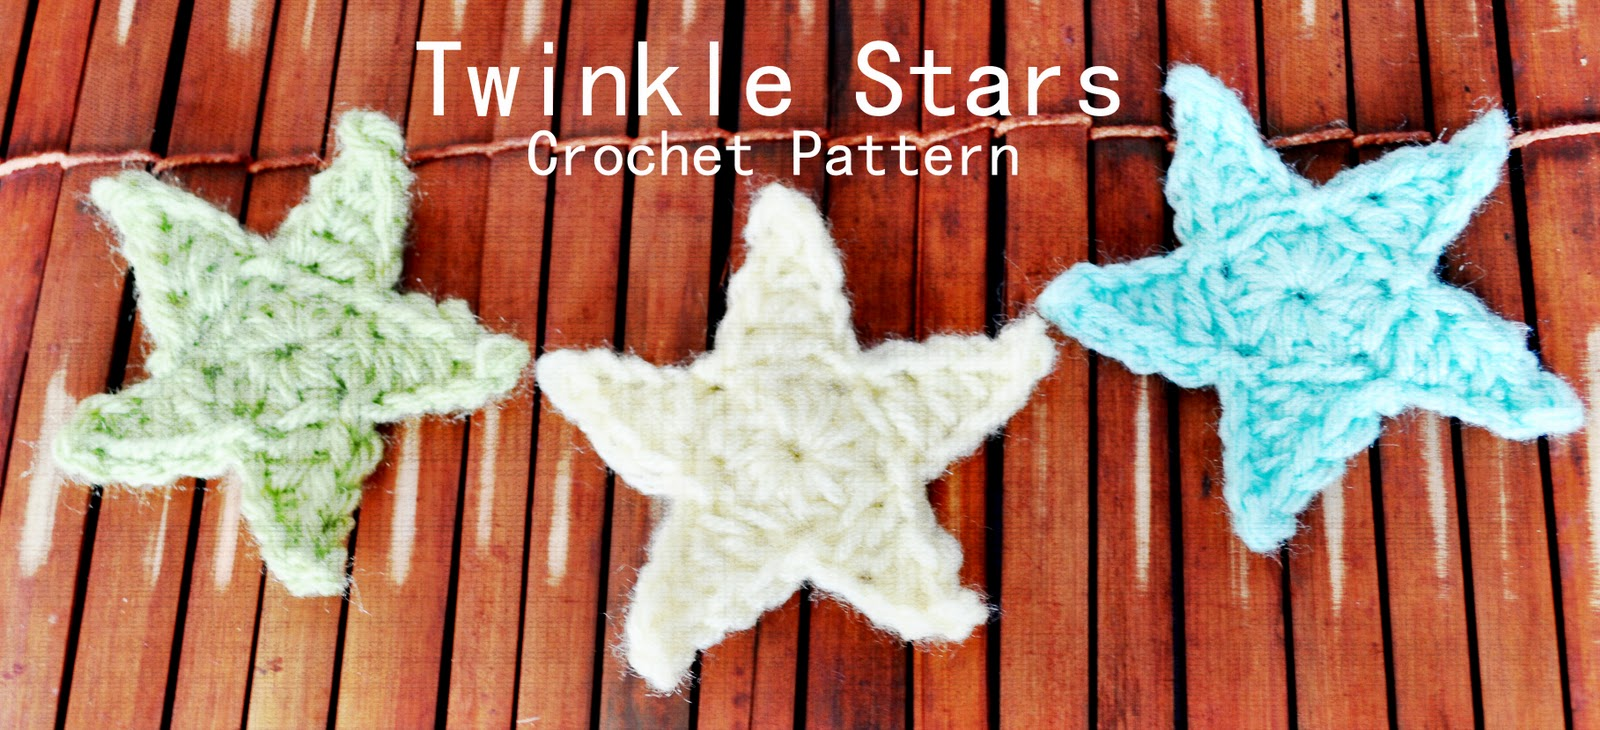 Star square crochet pattern free crochet pattern courtesy of